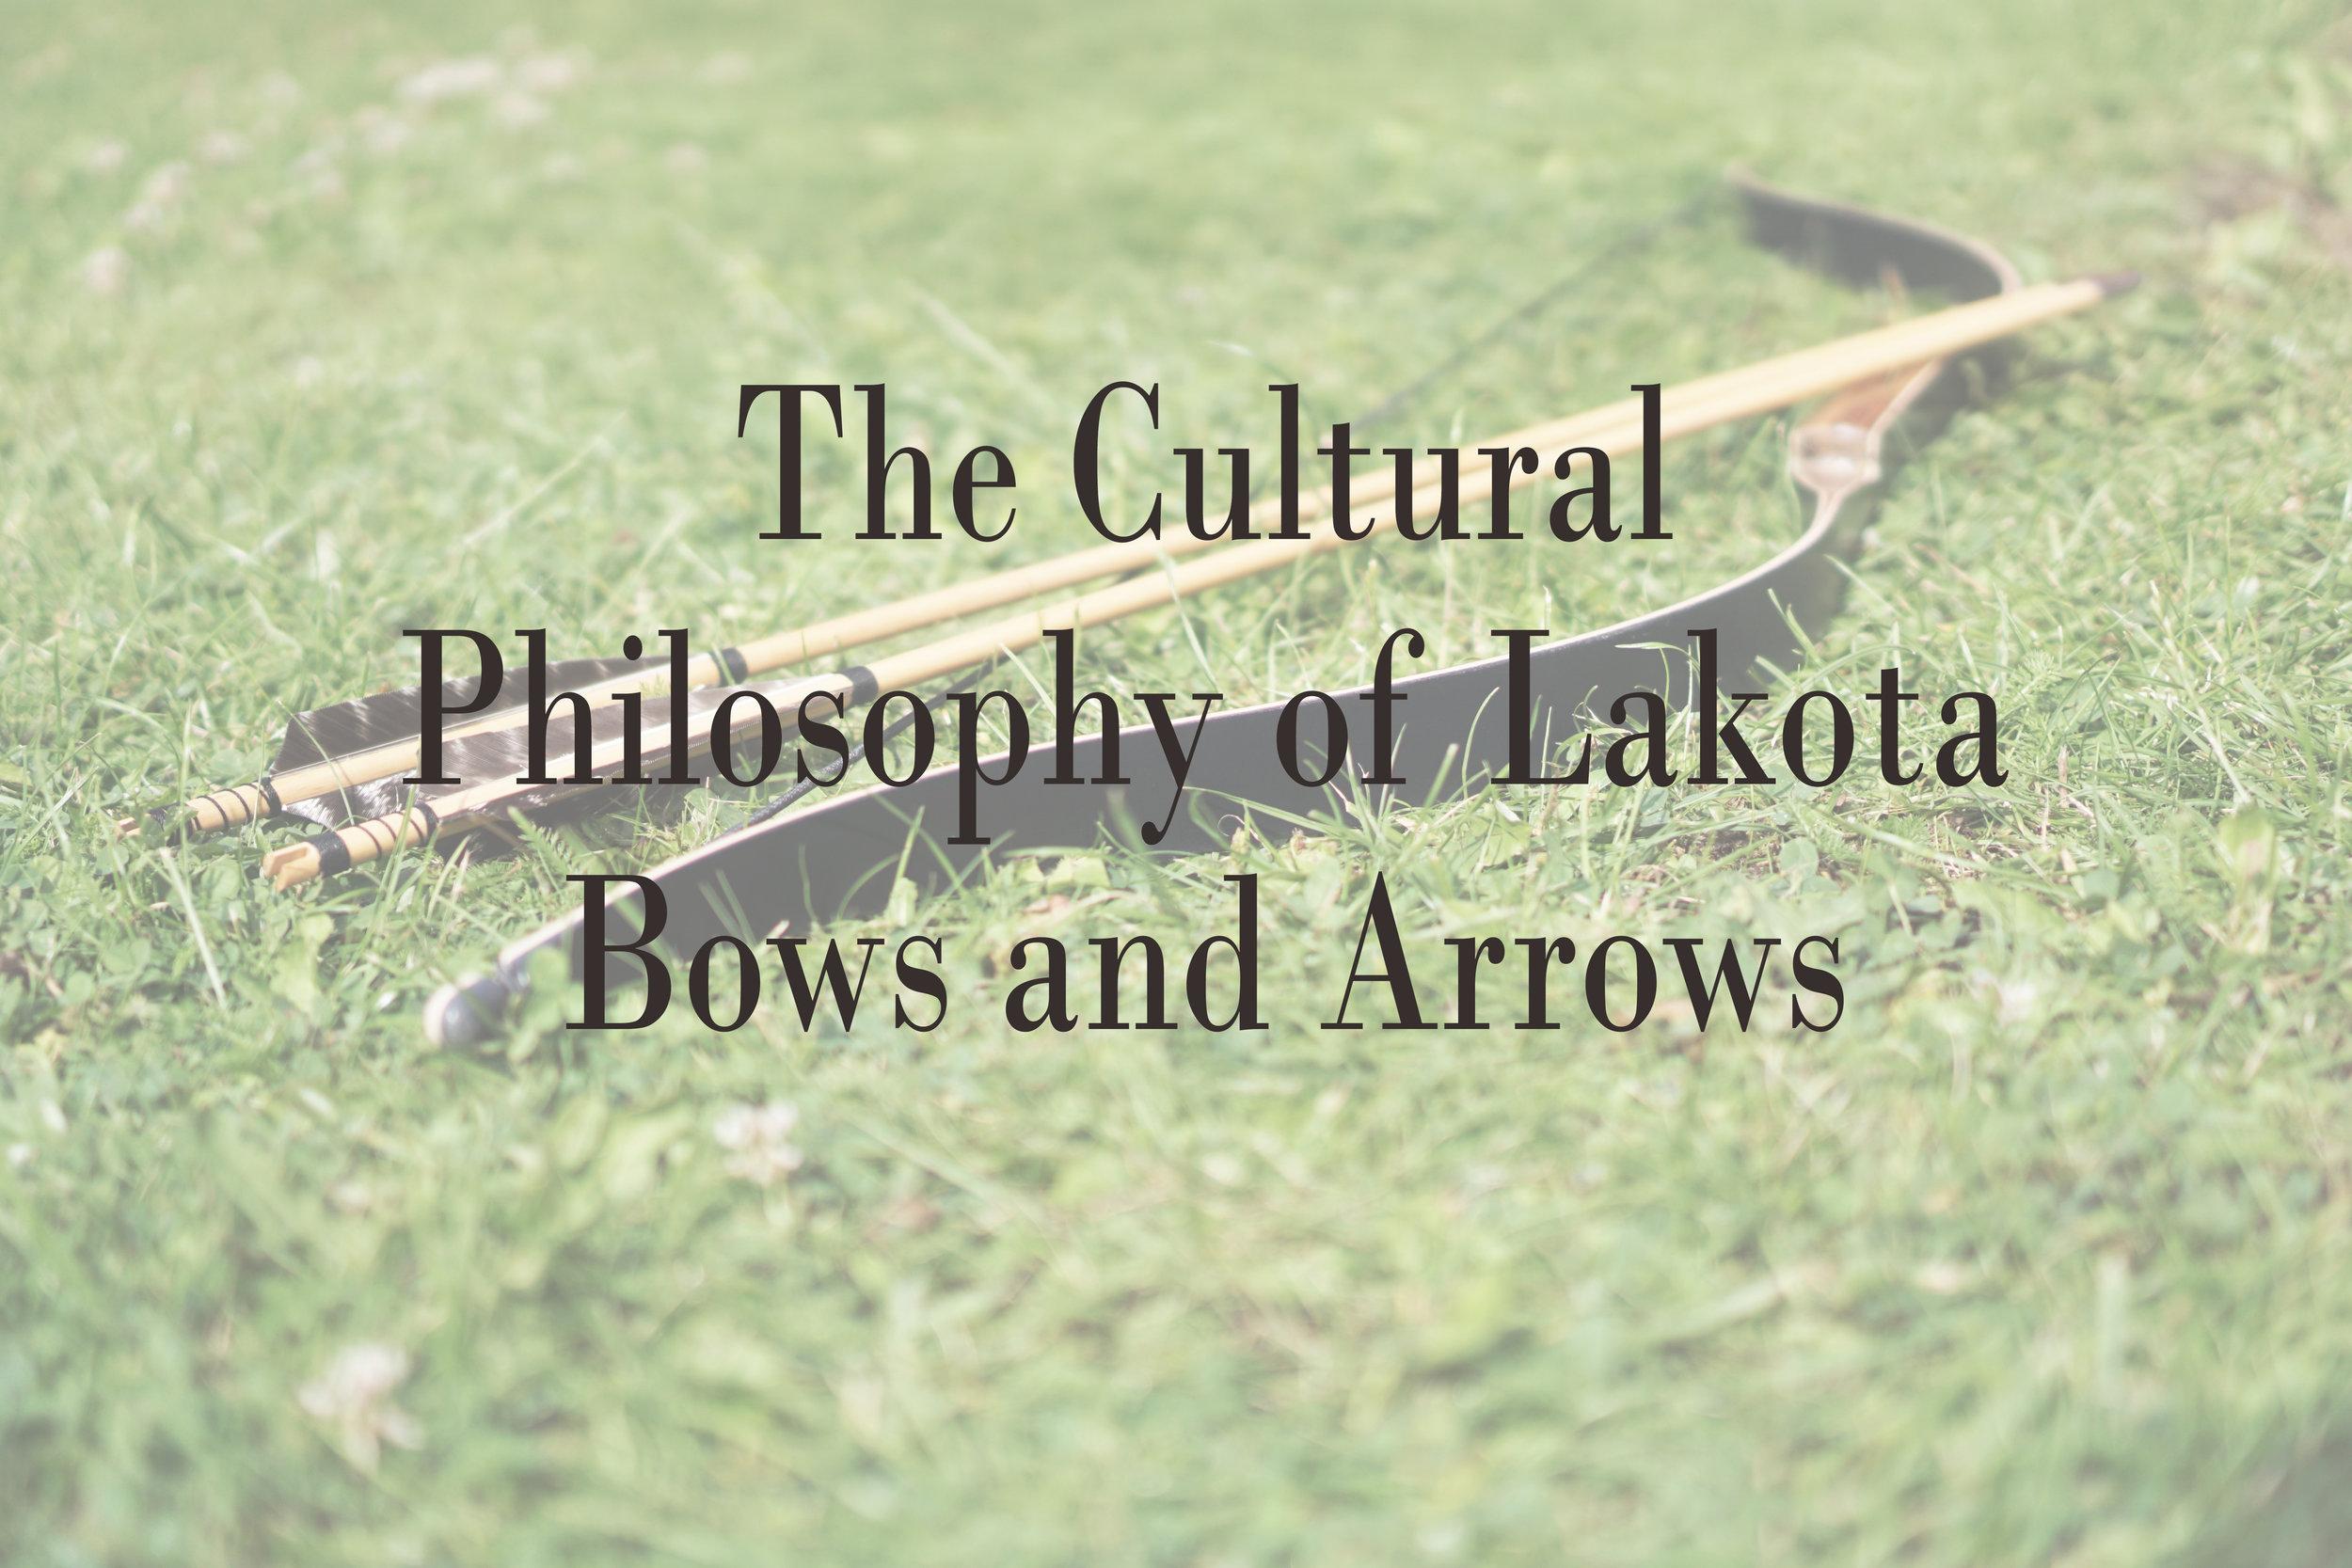 Lakota Bows and arrows.jpg